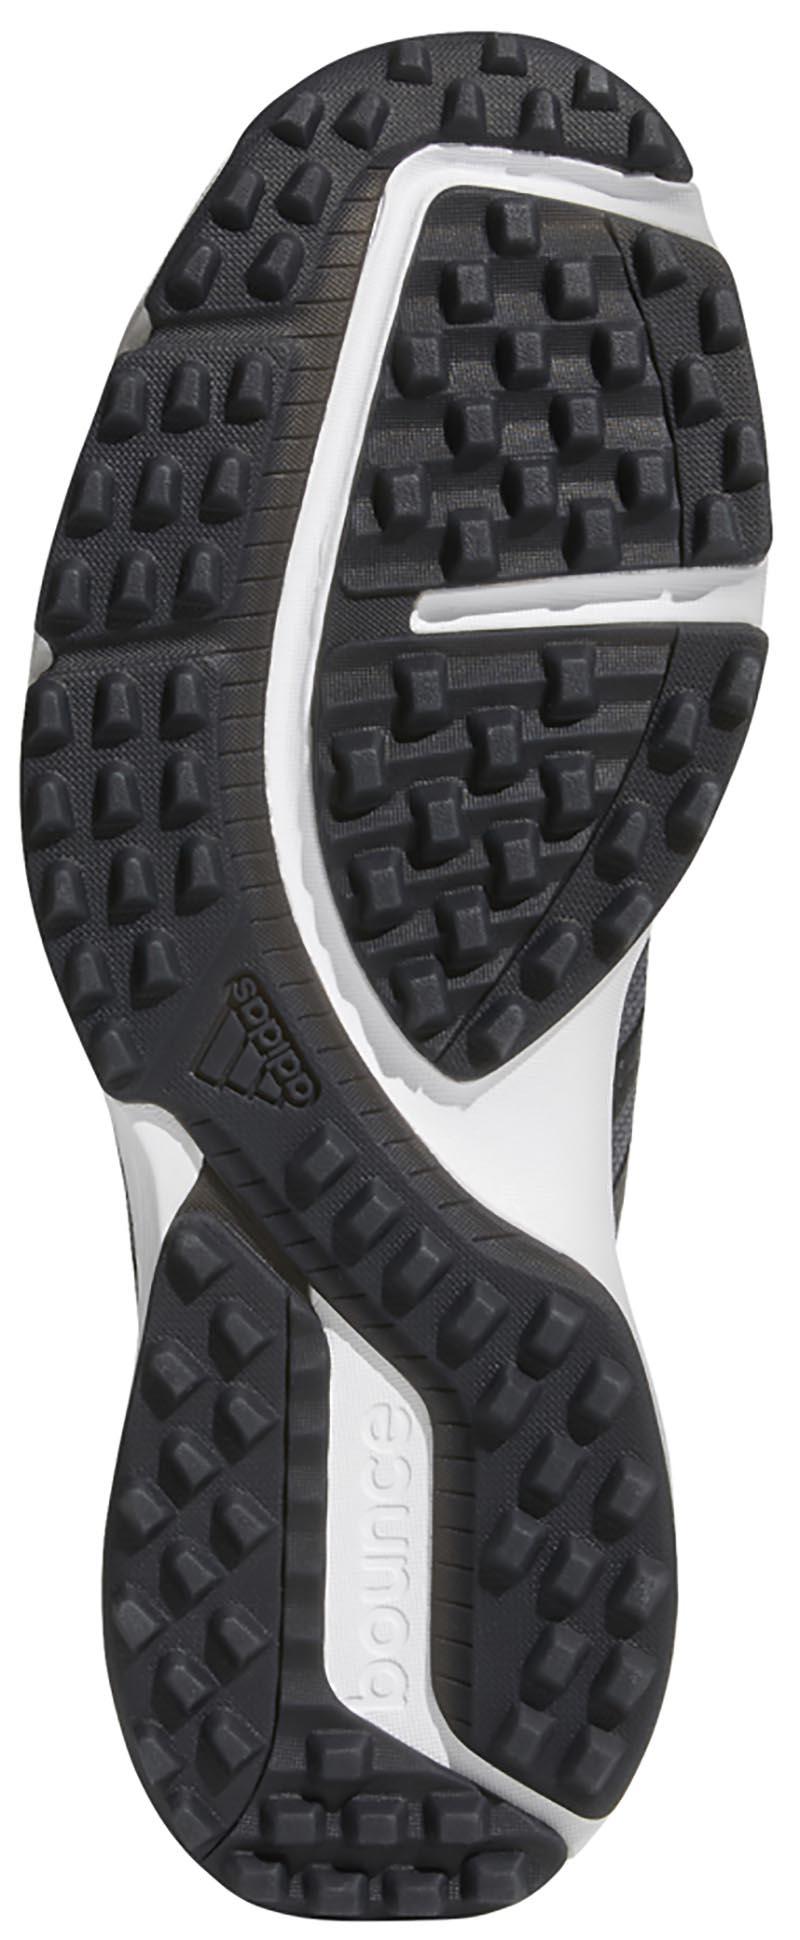 Zapatos de golf adidas 360 Traxion grises 02